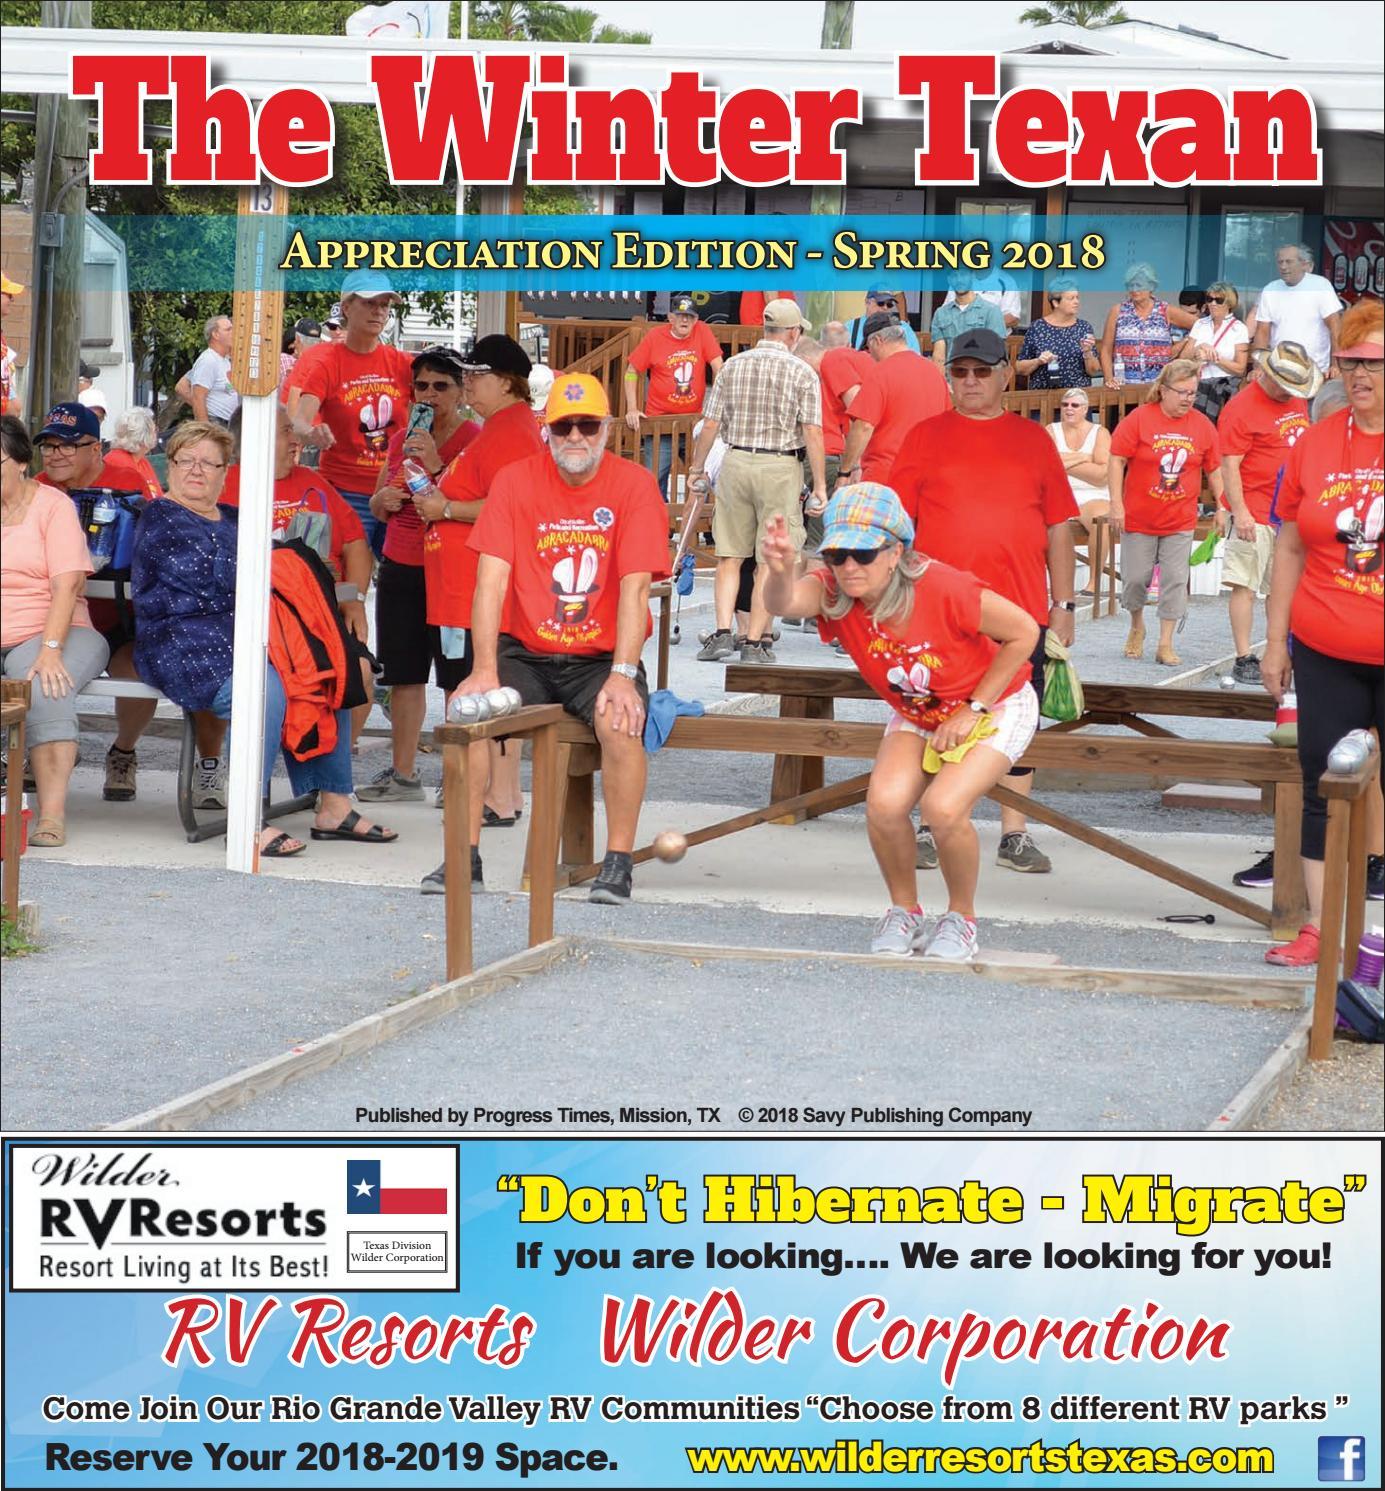 c90970c5c5af 2018 Spring Winter Texan by Progress Times - issuu